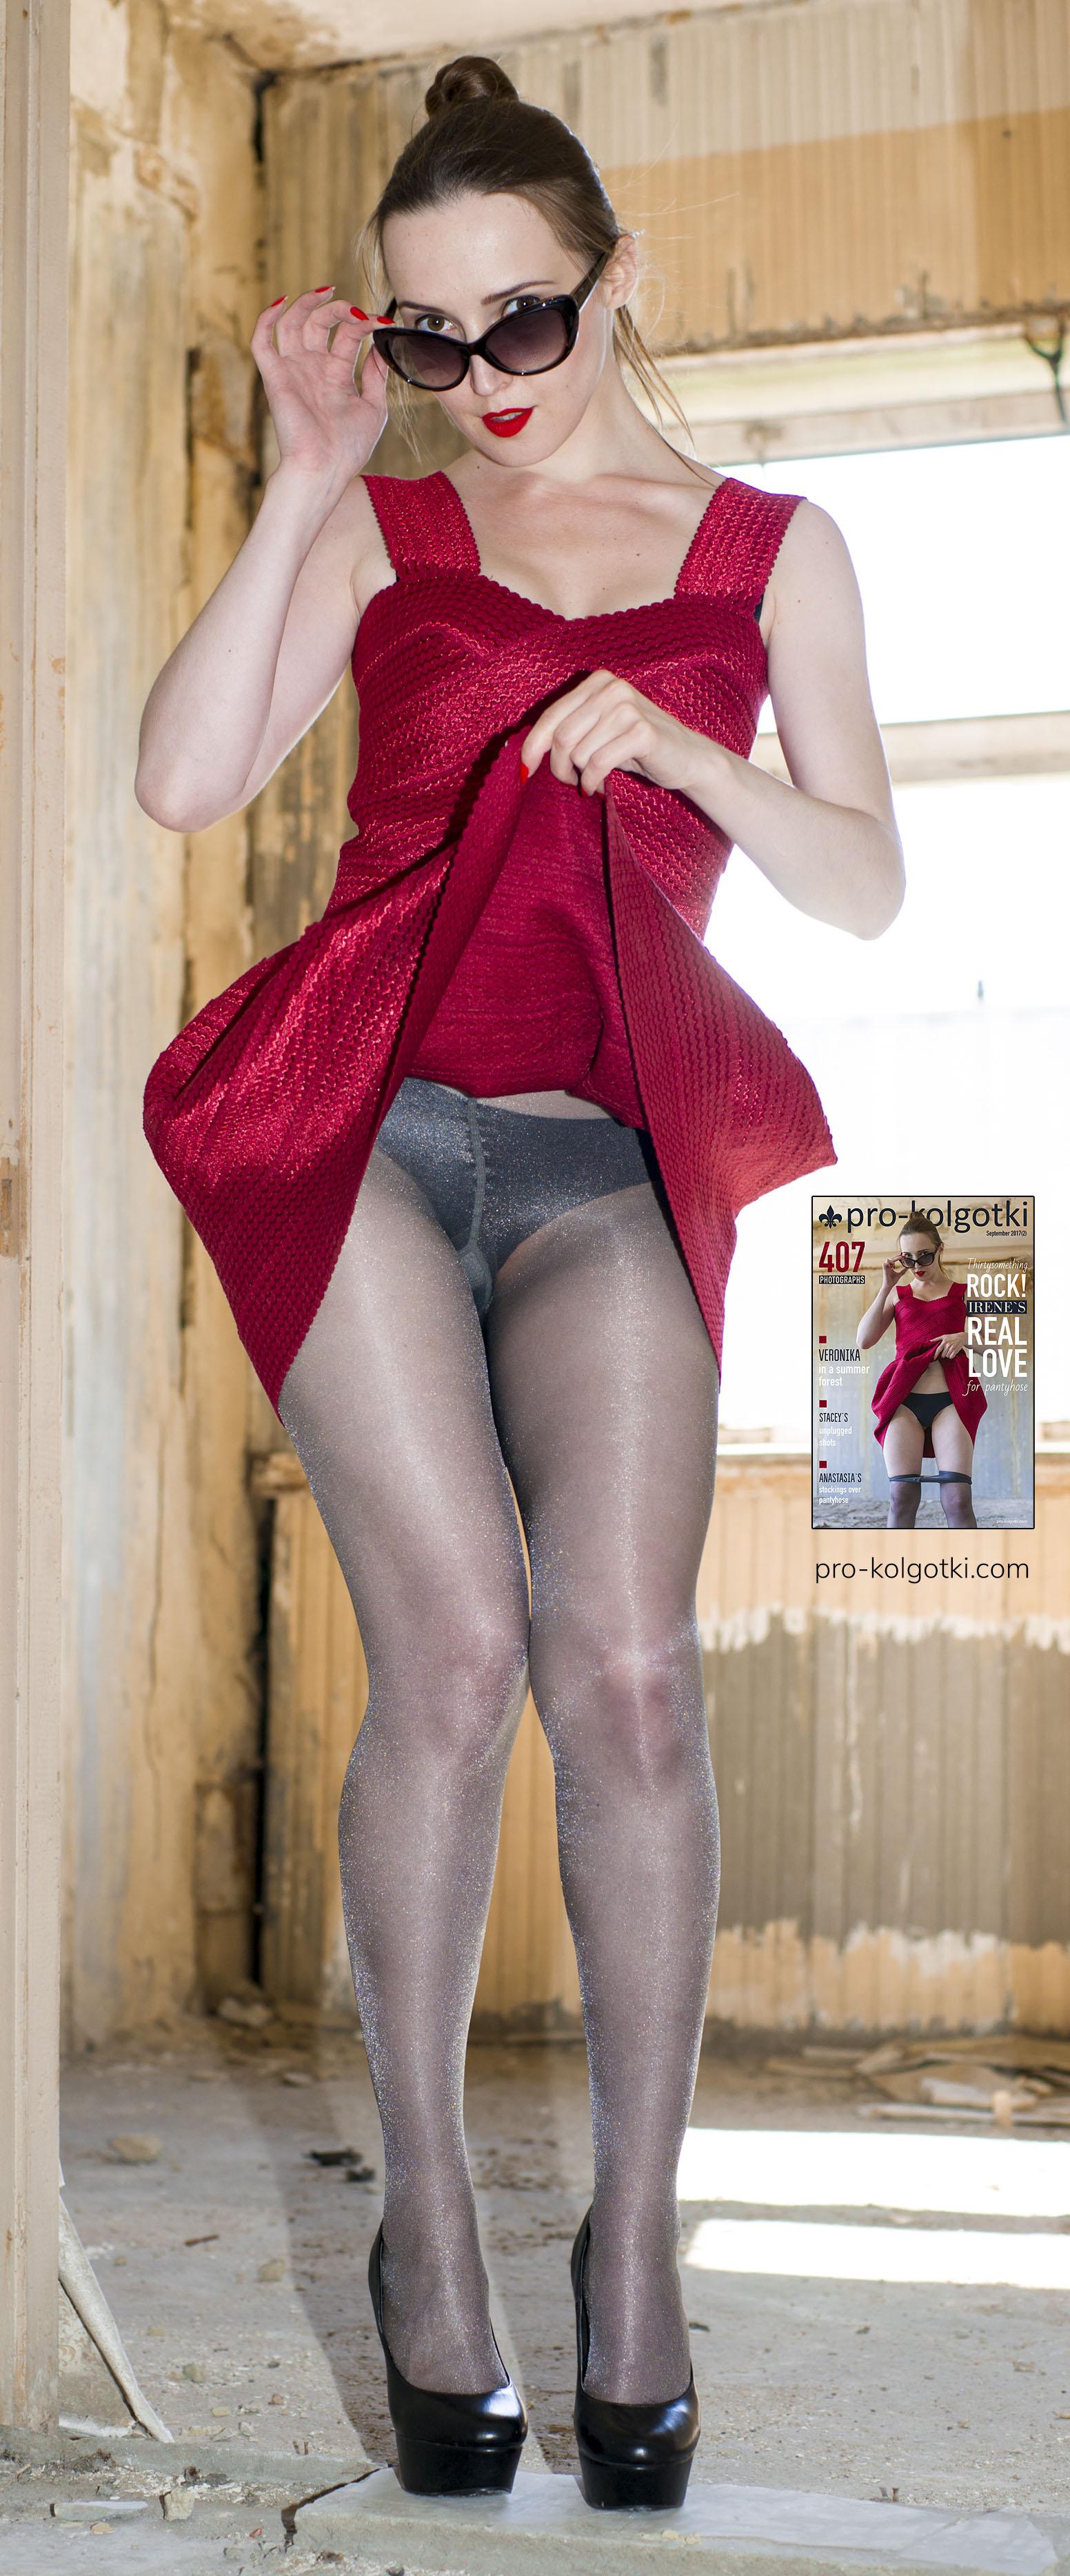 girls full body in sheer tights - picture from pro-kolgotki magazine September 2017 (part 2)